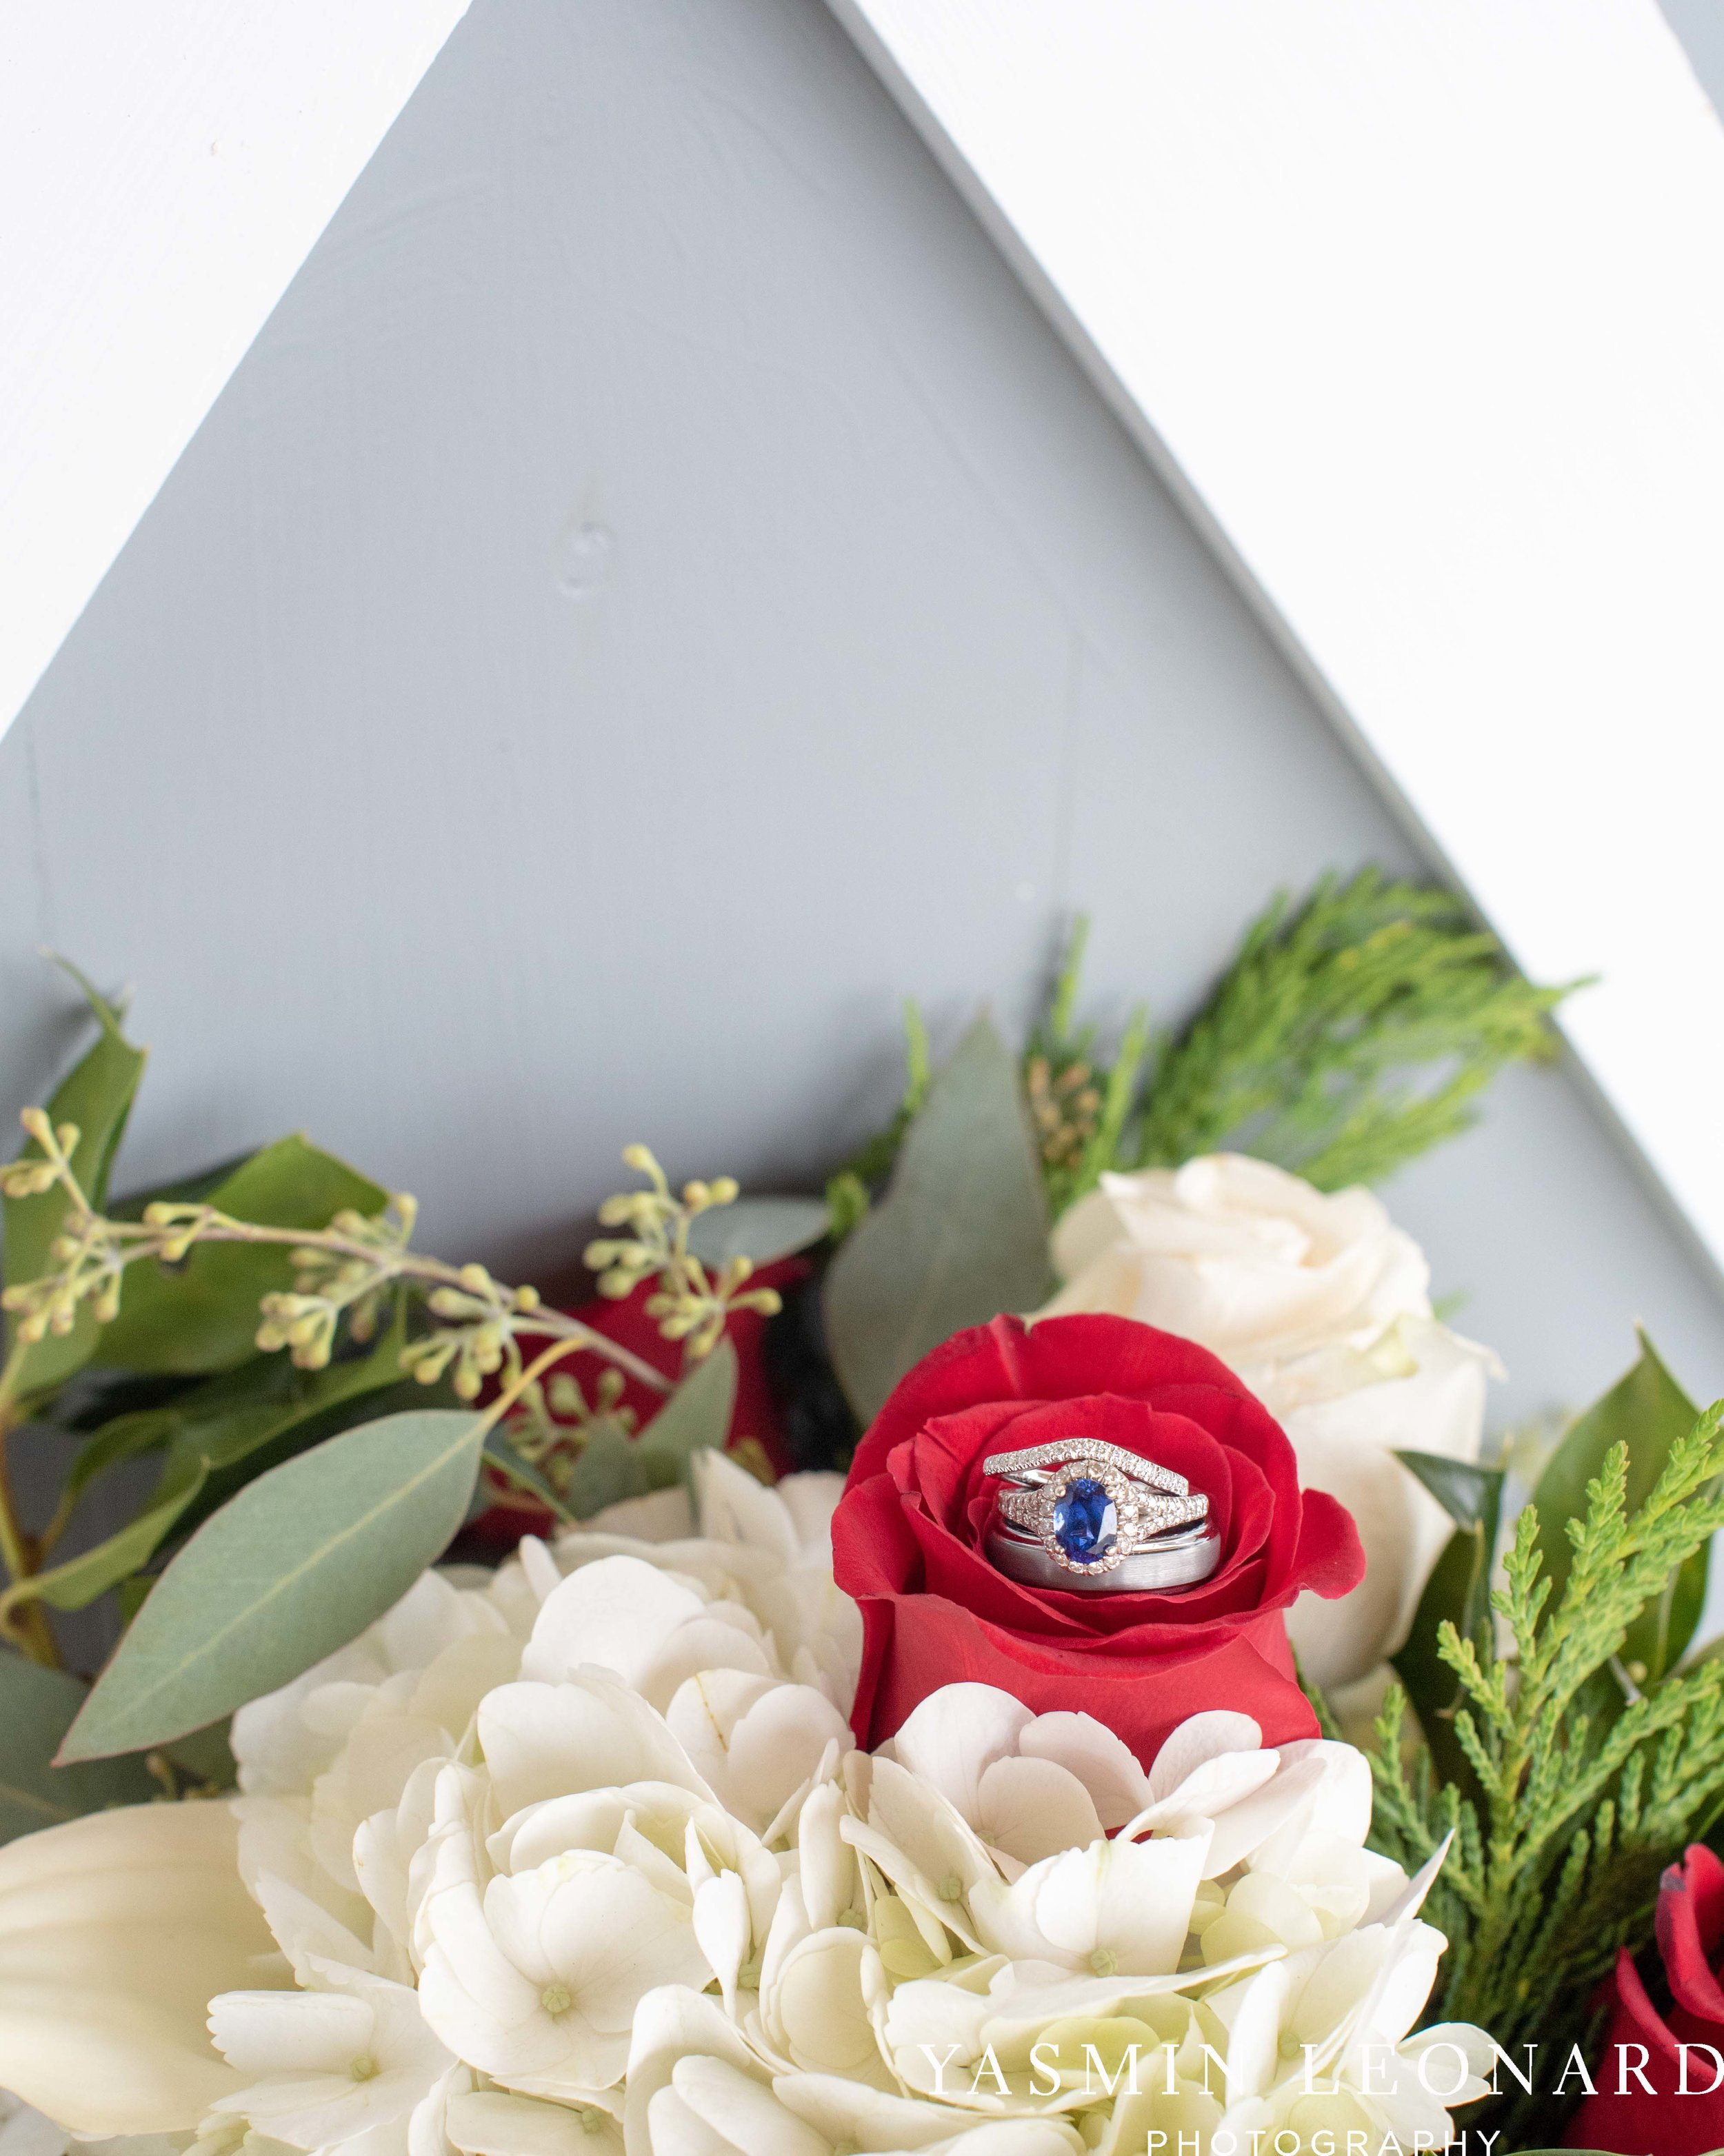 Secret Meadows at Green Dell Farm, NC Barns, NC Wedding Venues, Triad, NC, NC Wedding Photography, Triad Wedding Venues, Affordable Wedding Venues, NEW Wedding Venues, Christmas Weddings-3.jpg